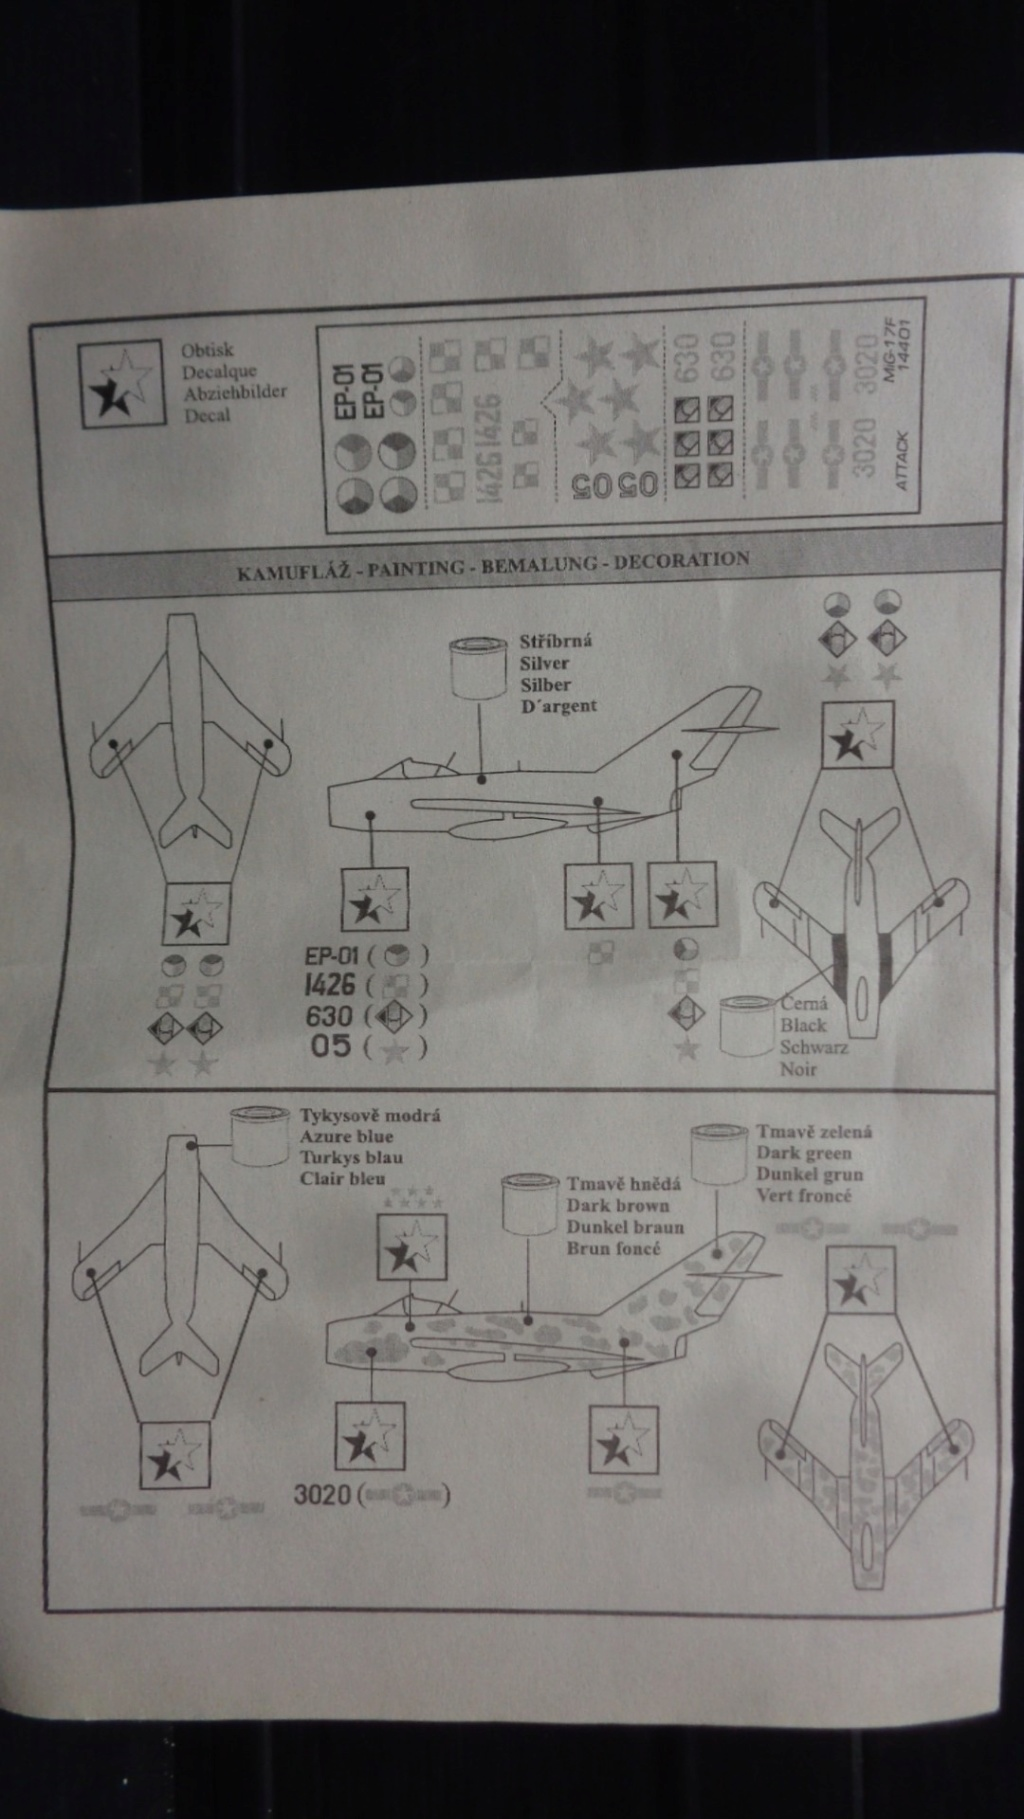 MIG 17 F  Attack Hobby Kits (Jach) 1/144 Dsc07549